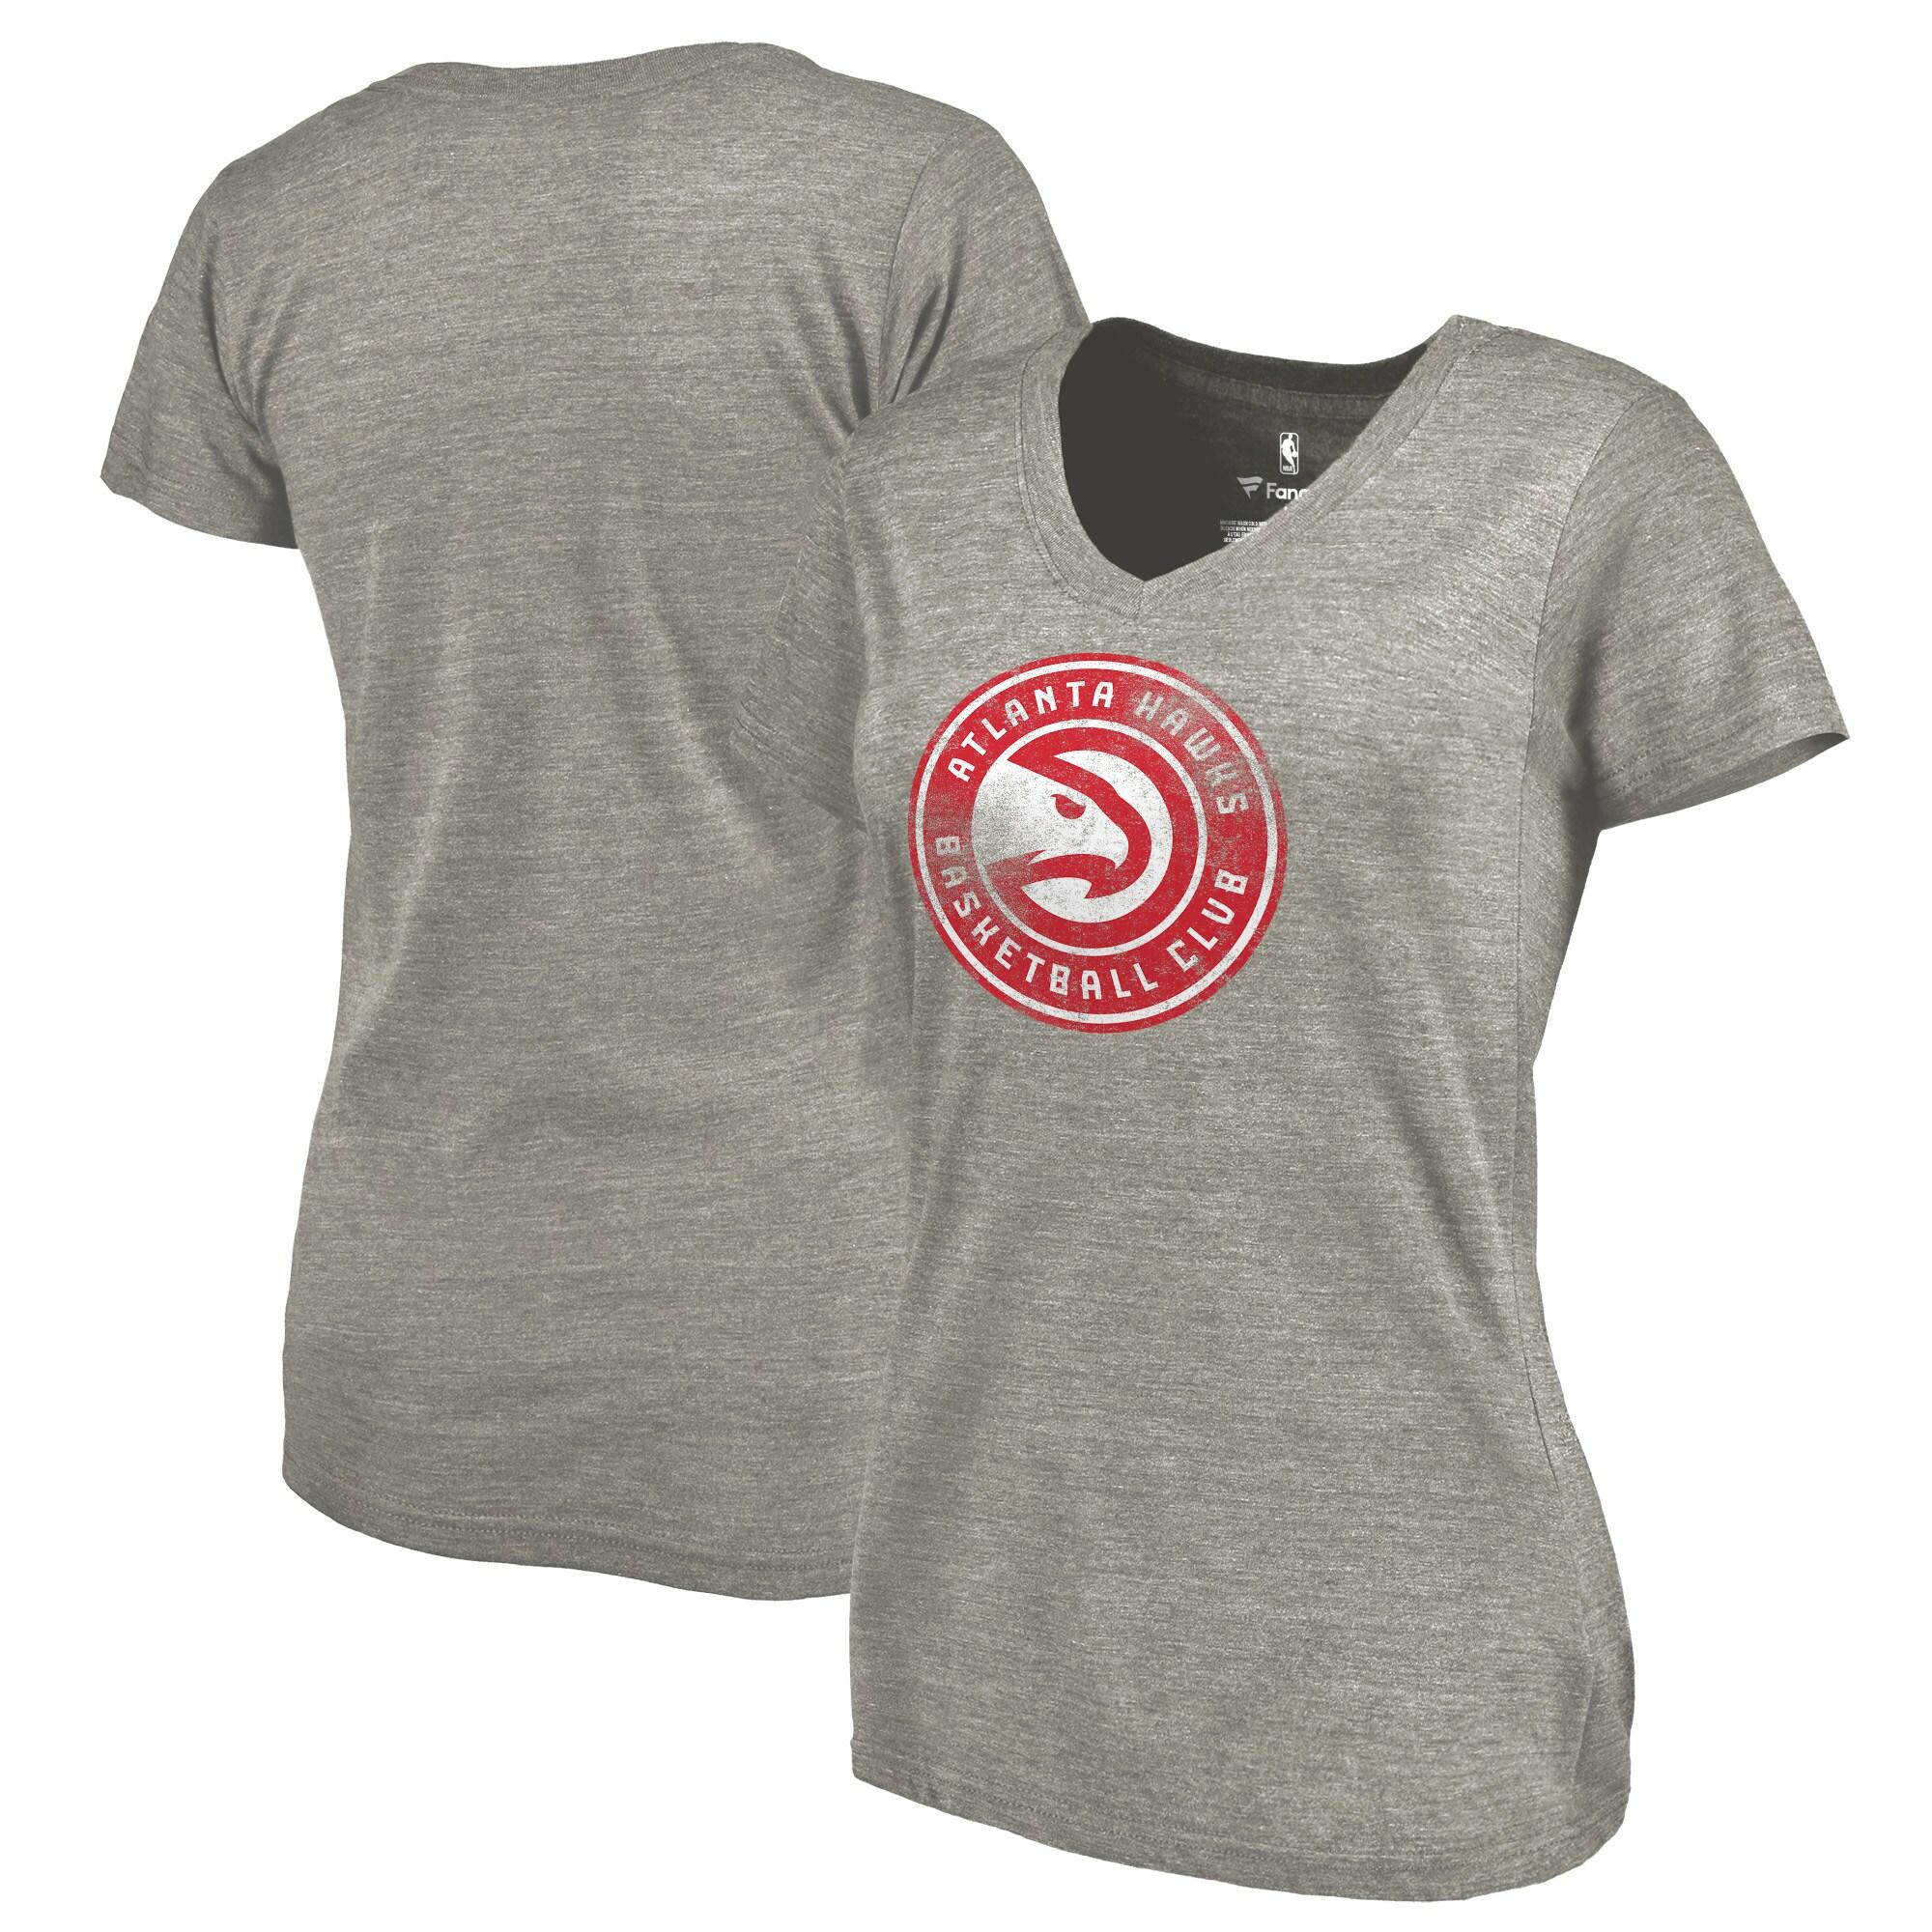 Atlanta Hawks Fanatics Branded Women's Distressed Logo Tri-Blend V-Neck T-Shirt - Ash